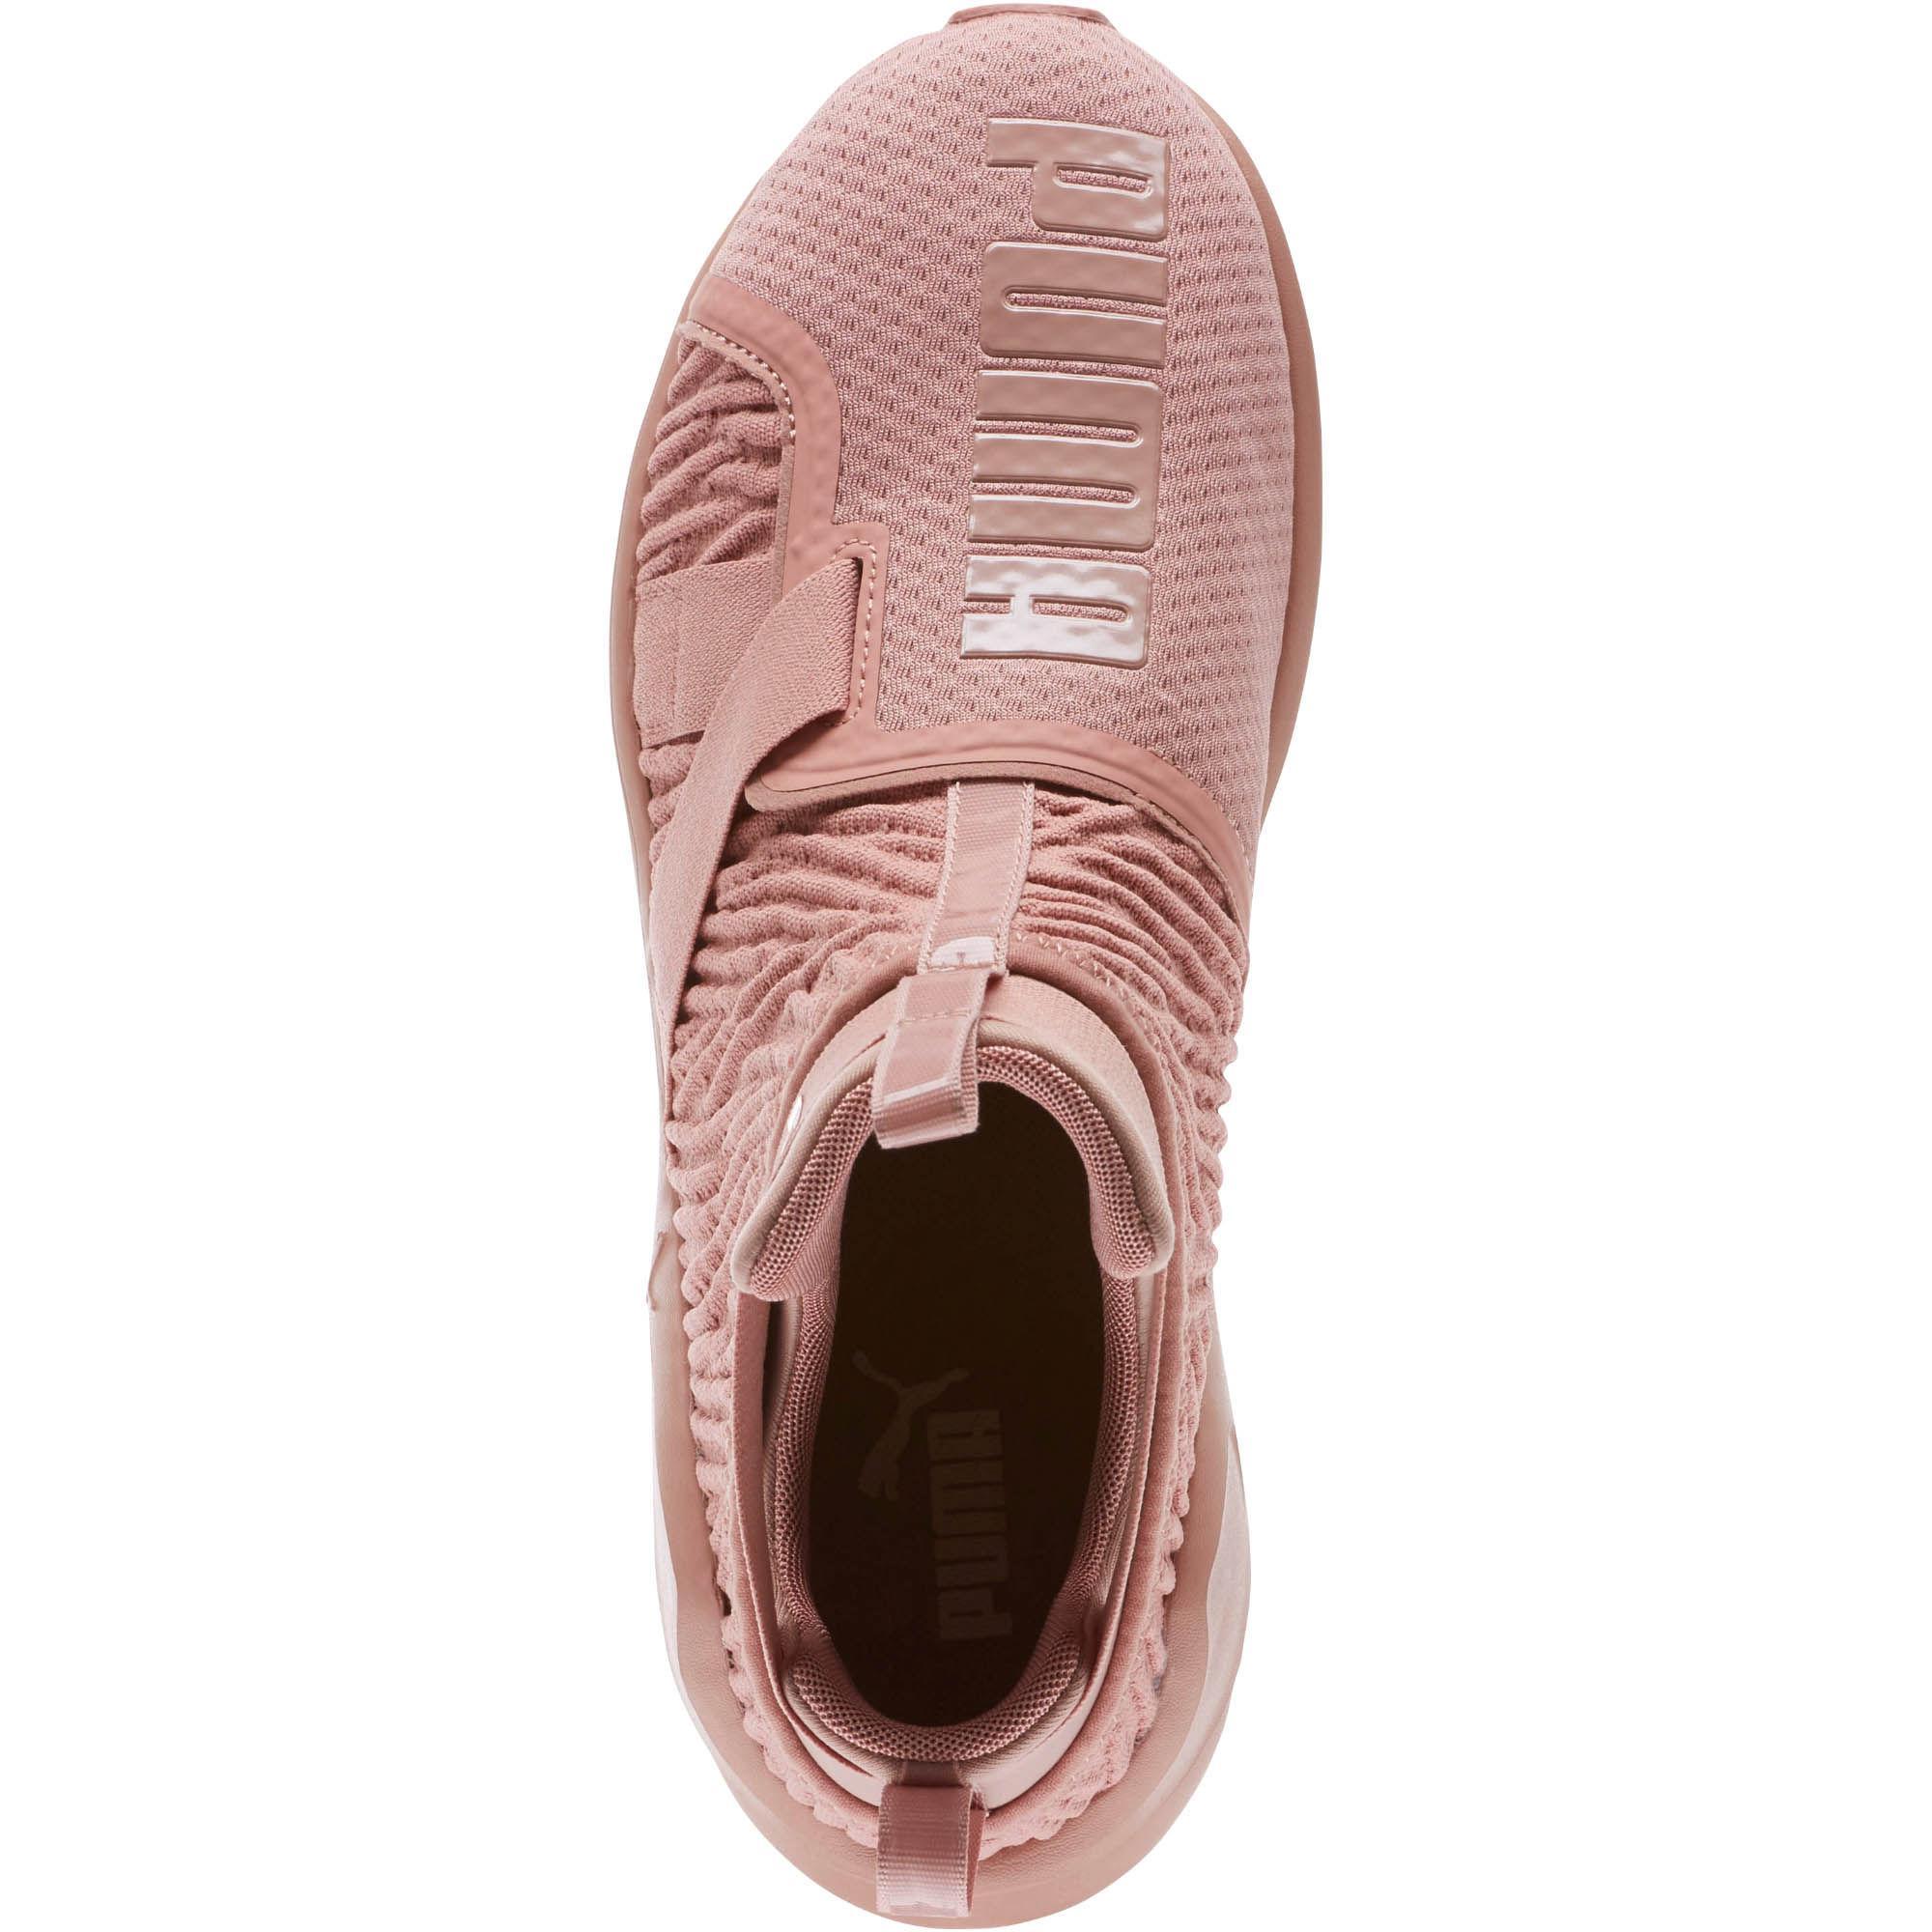 1aad21d9e12a0a Lyst - PUMA Fierce Strap Hypernature Women s Training Shoes in Brown